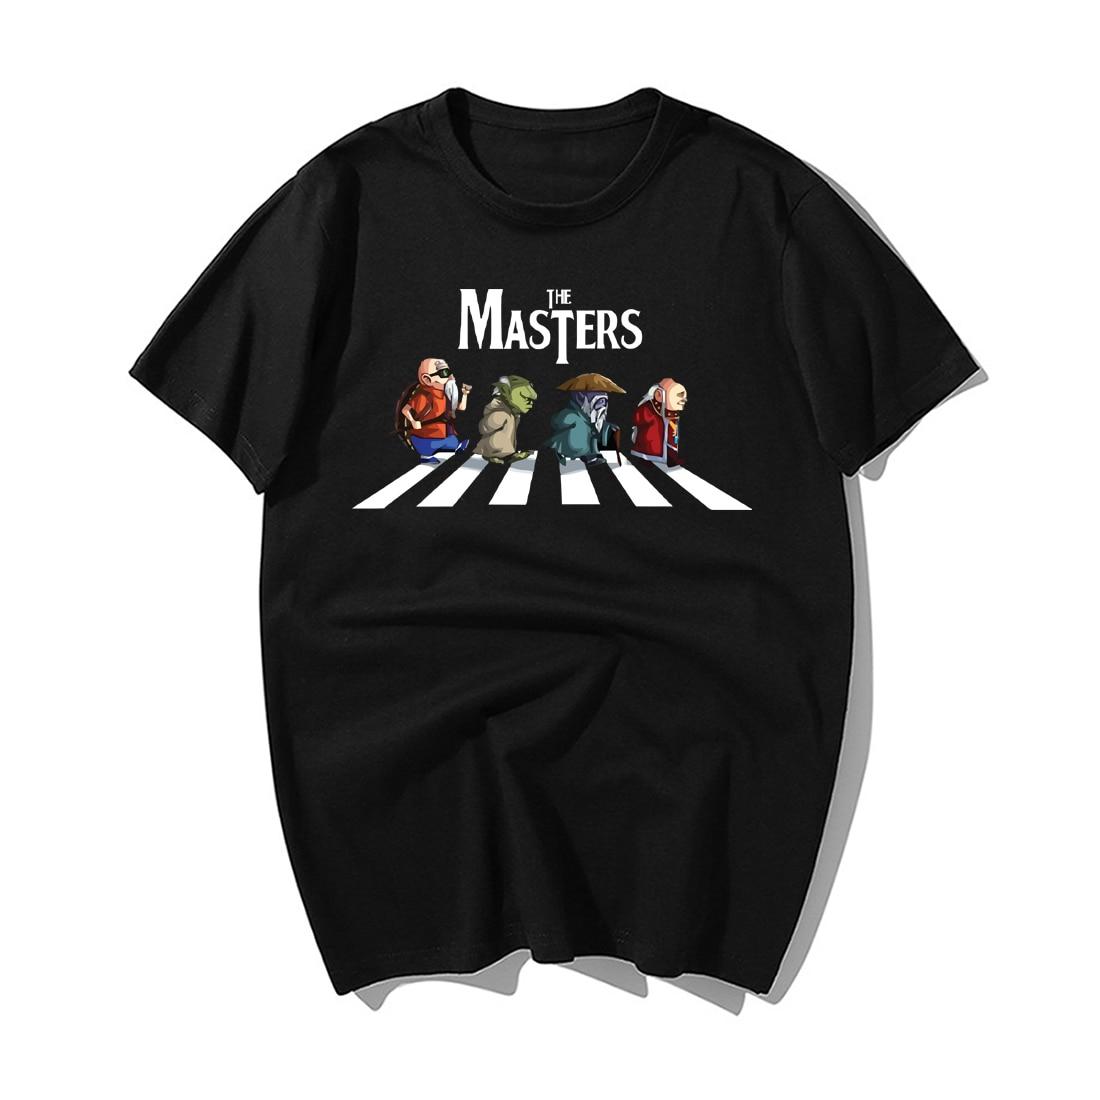 Funny Anime Shirt The Masters Walking Across Fashion Print Tshirt Men Summer Casual High Quality Cotton Short Sleeve Tops Tees